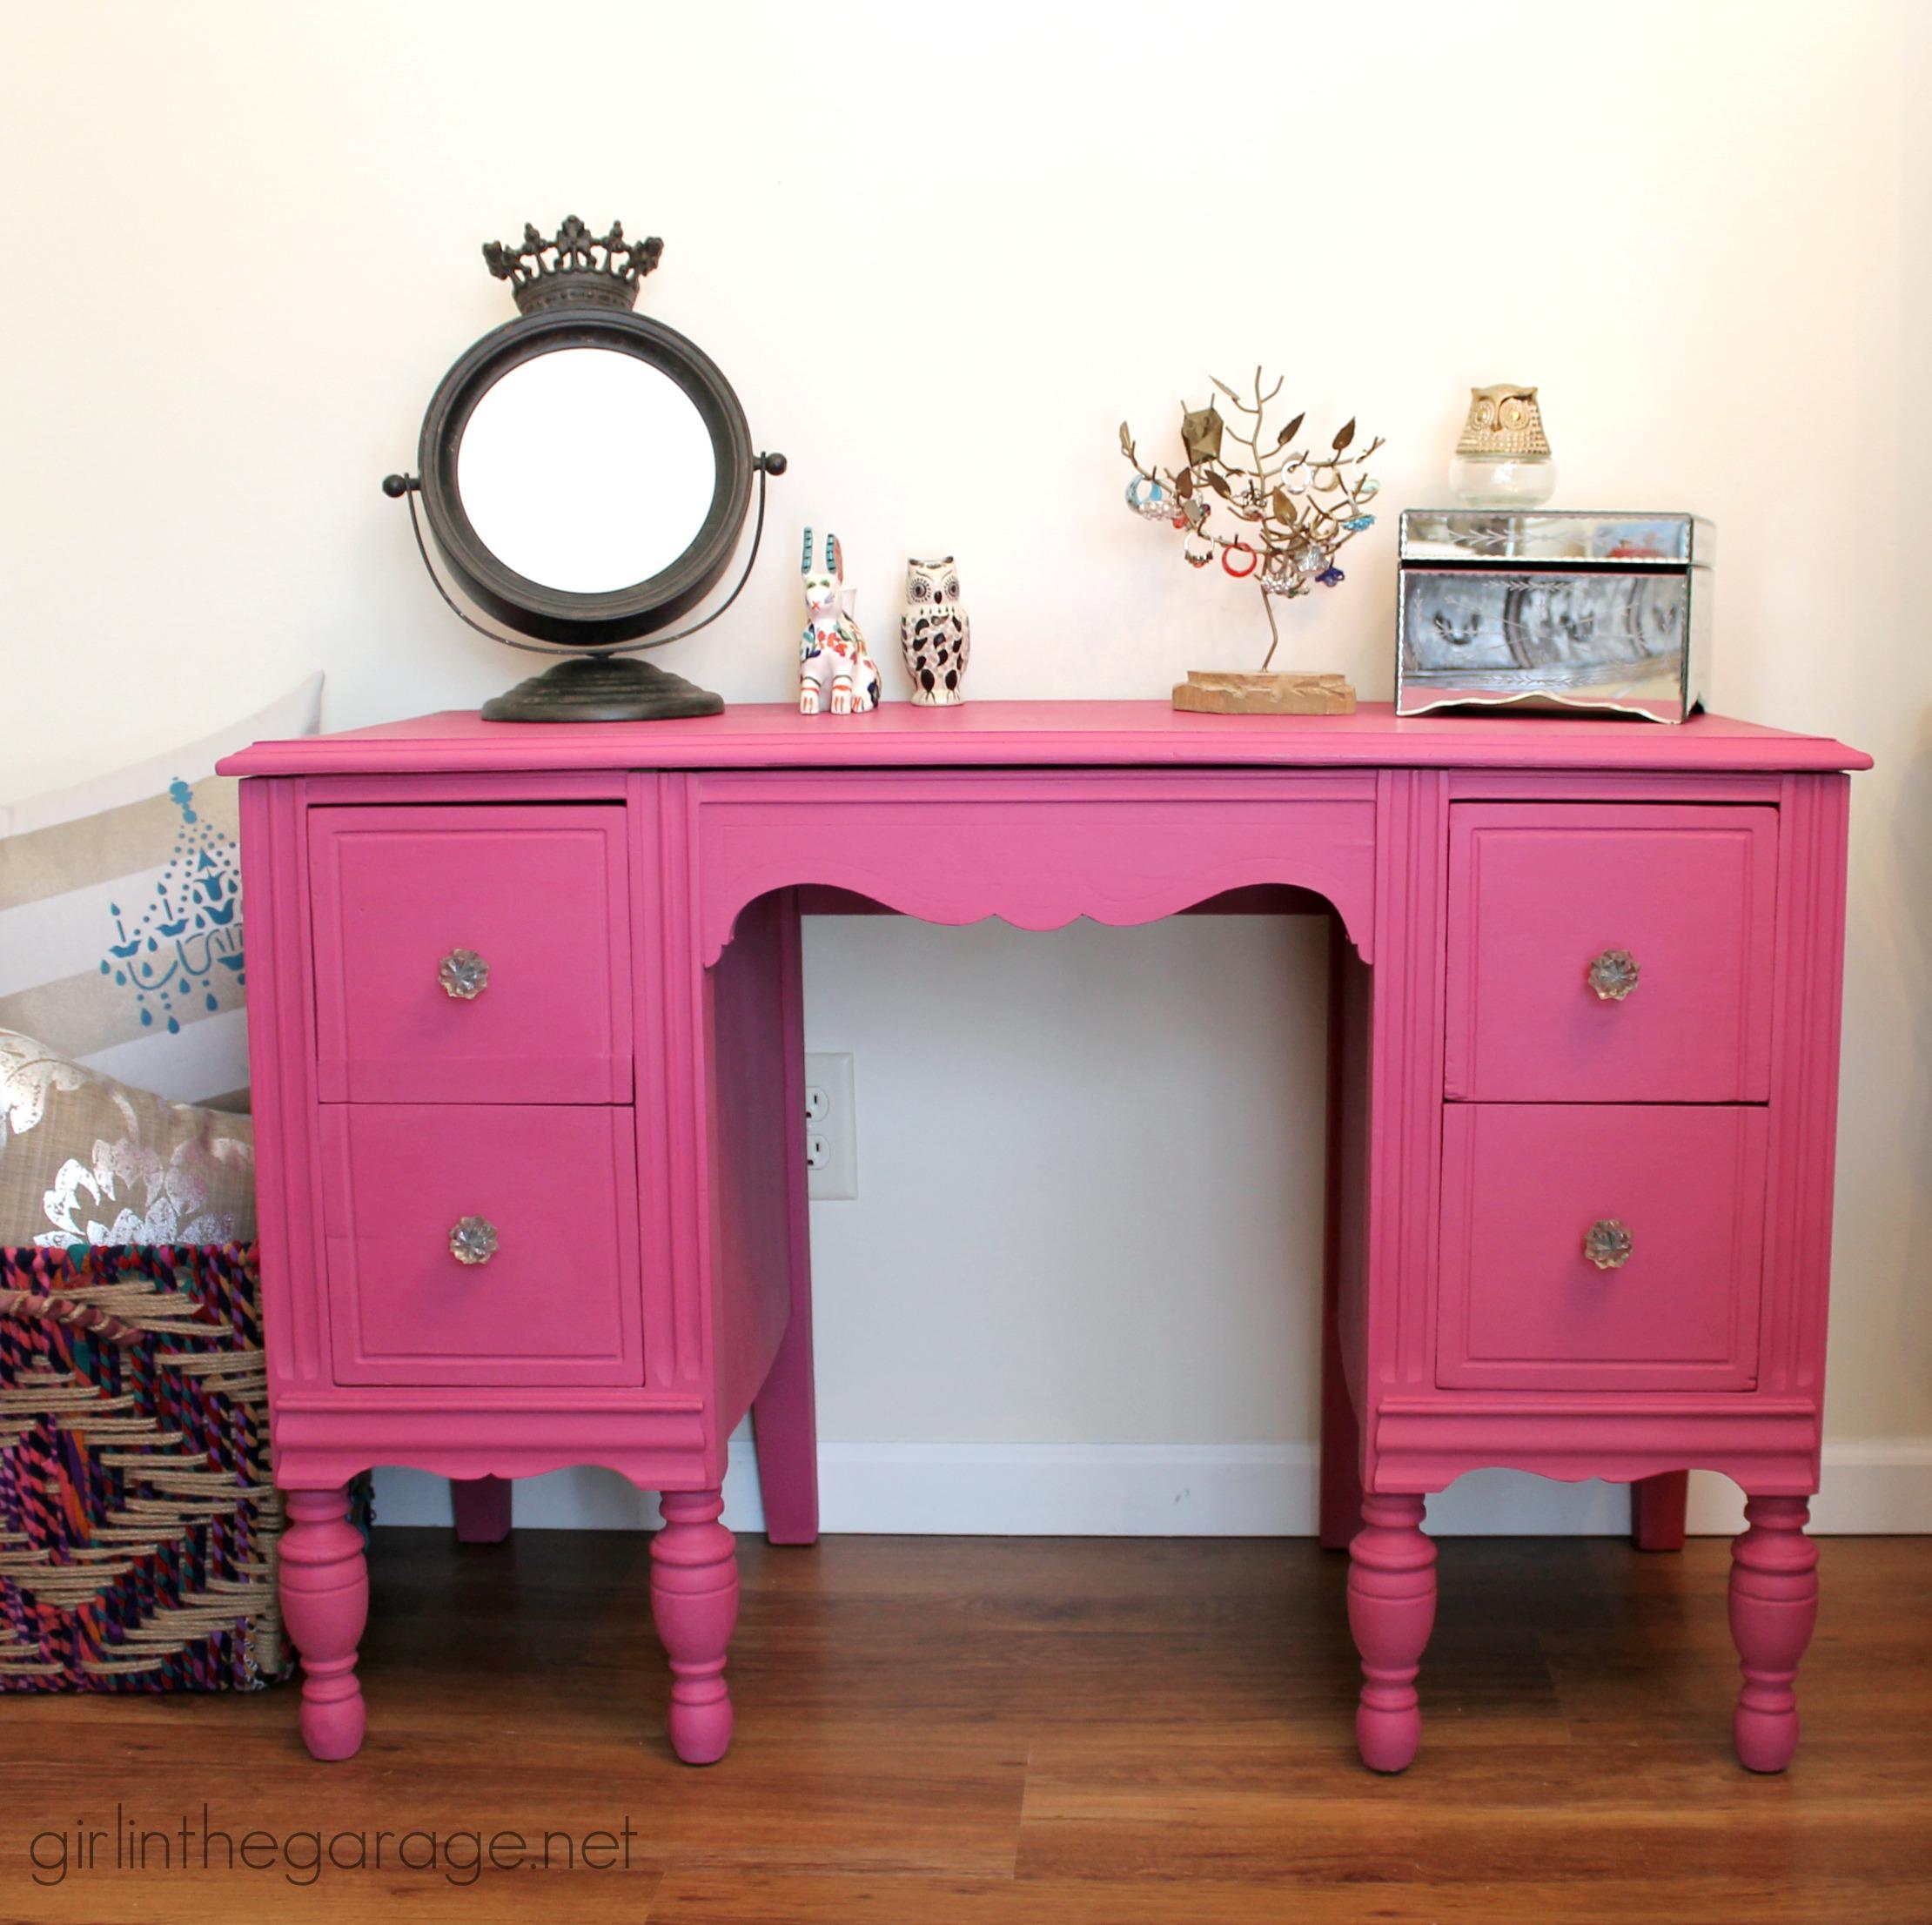 Boho Bedroom Decor Custom Pink Chalk Paint Vanity Girl In The Garage 174